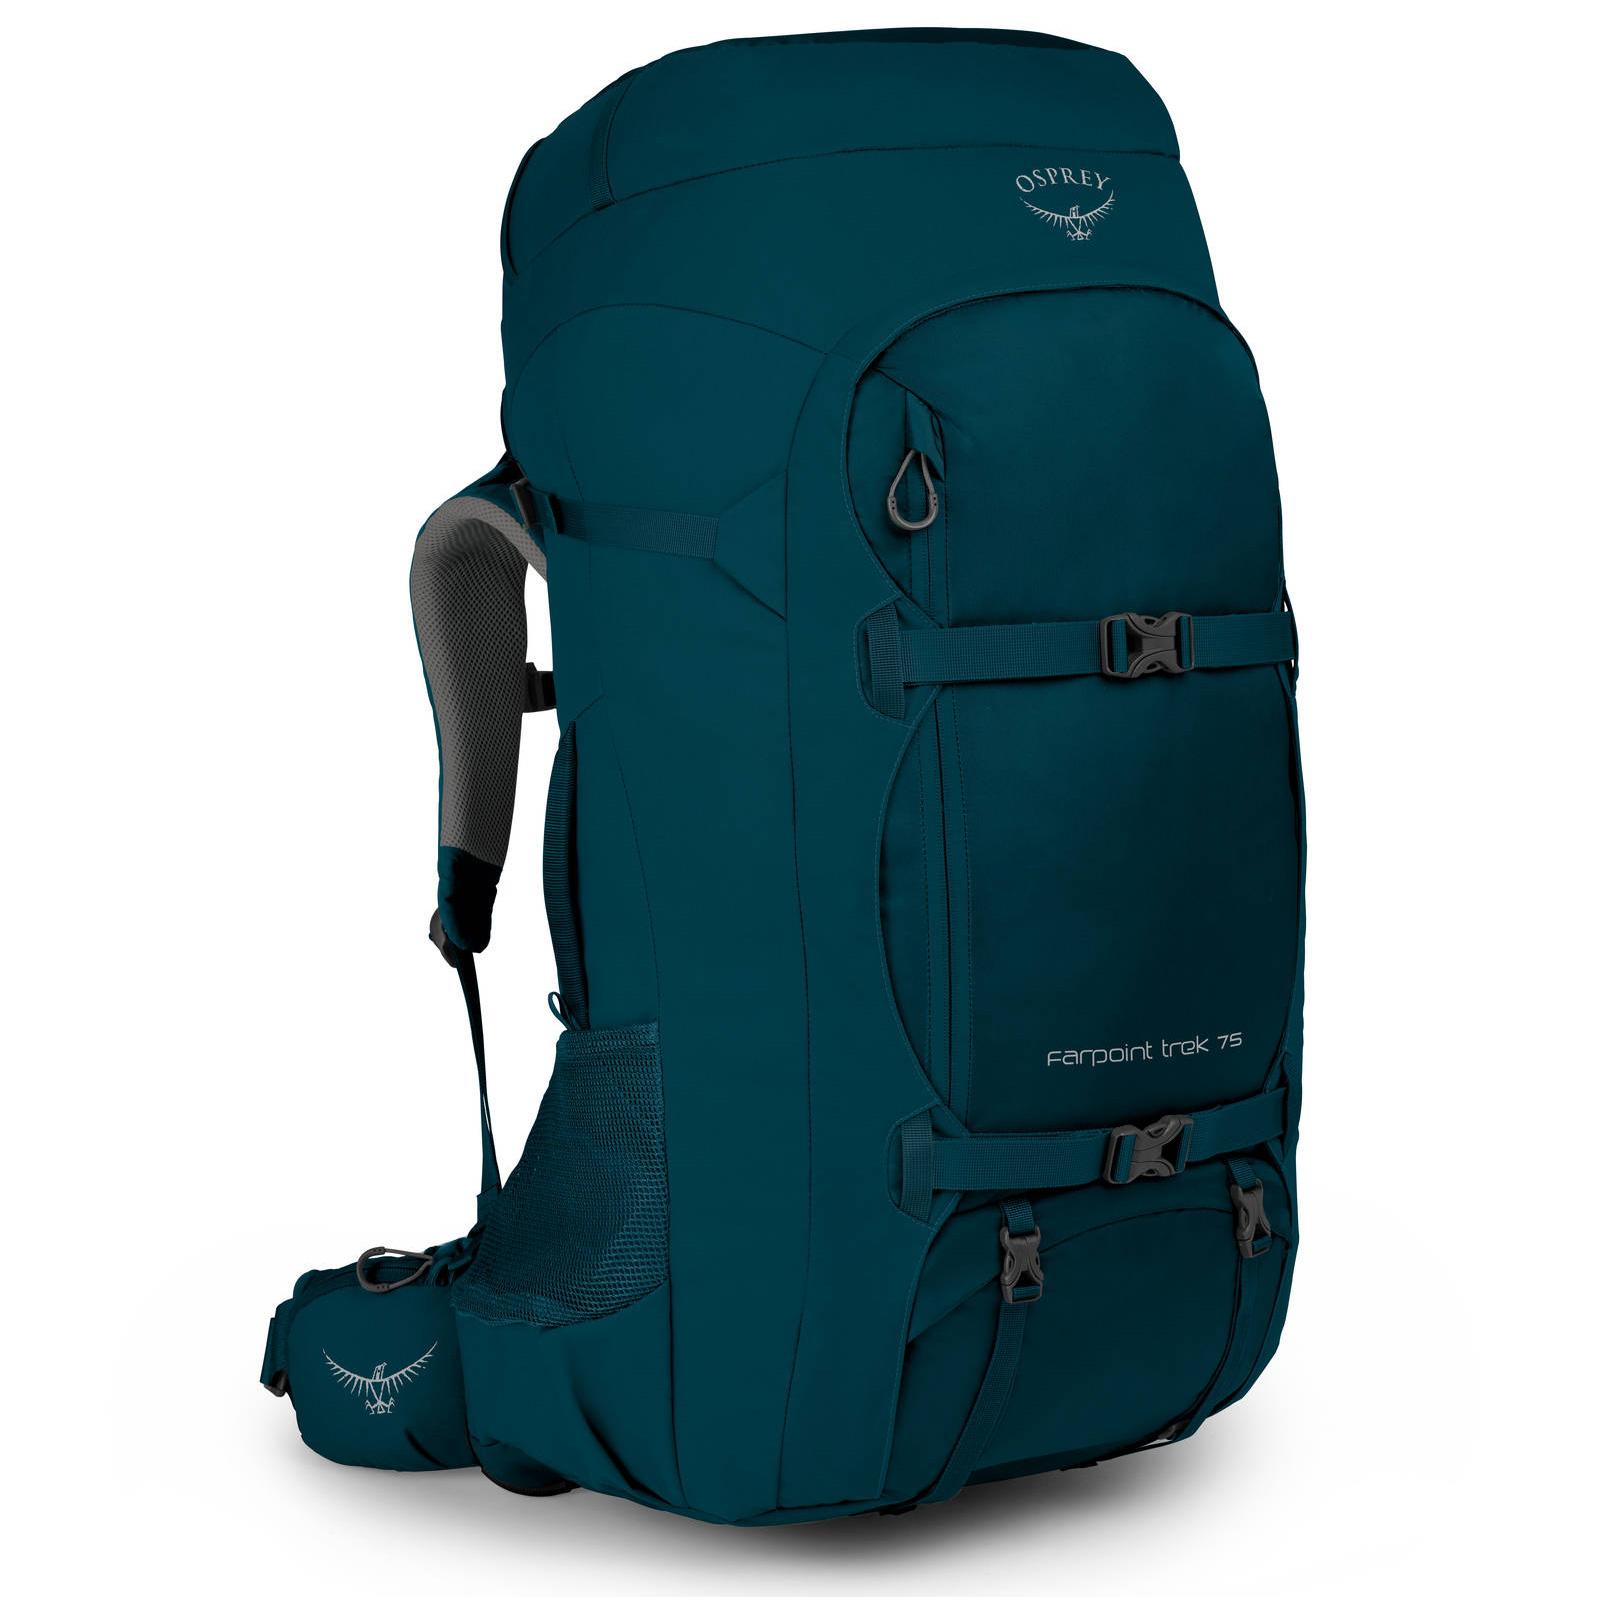 Osprey Farpoint Trek 75 - Backpack - Petrol Blue